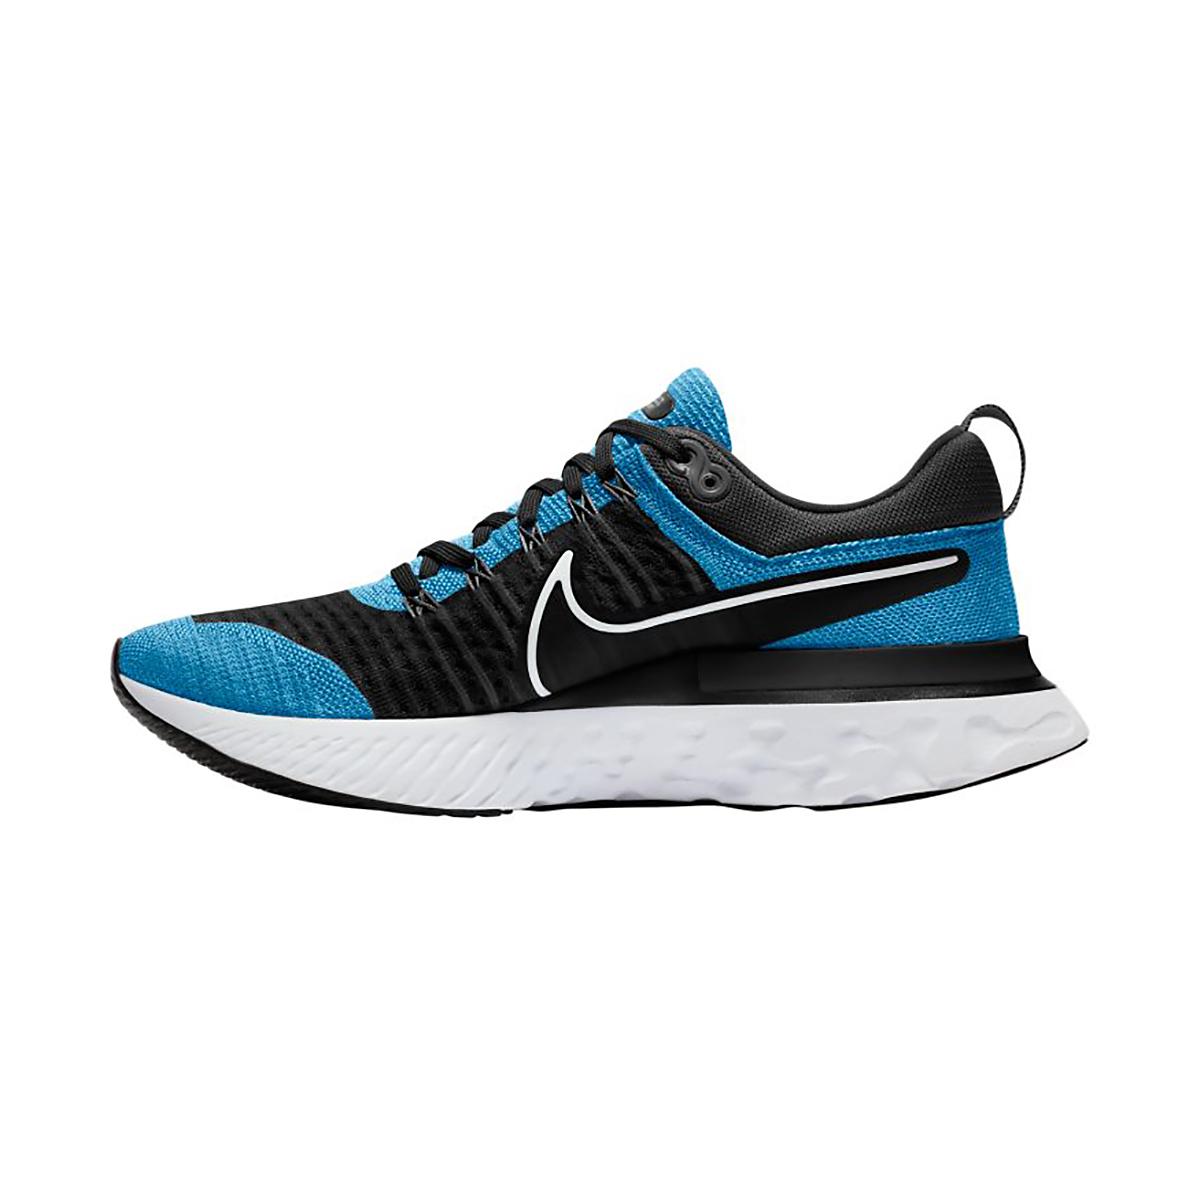 Men's Nike React Infinity Run Flyknit 2 Running Shoe - Color: Blue Orbit/White - Size: 8 - Width: Regular, Blue Orbit/White, large, image 2